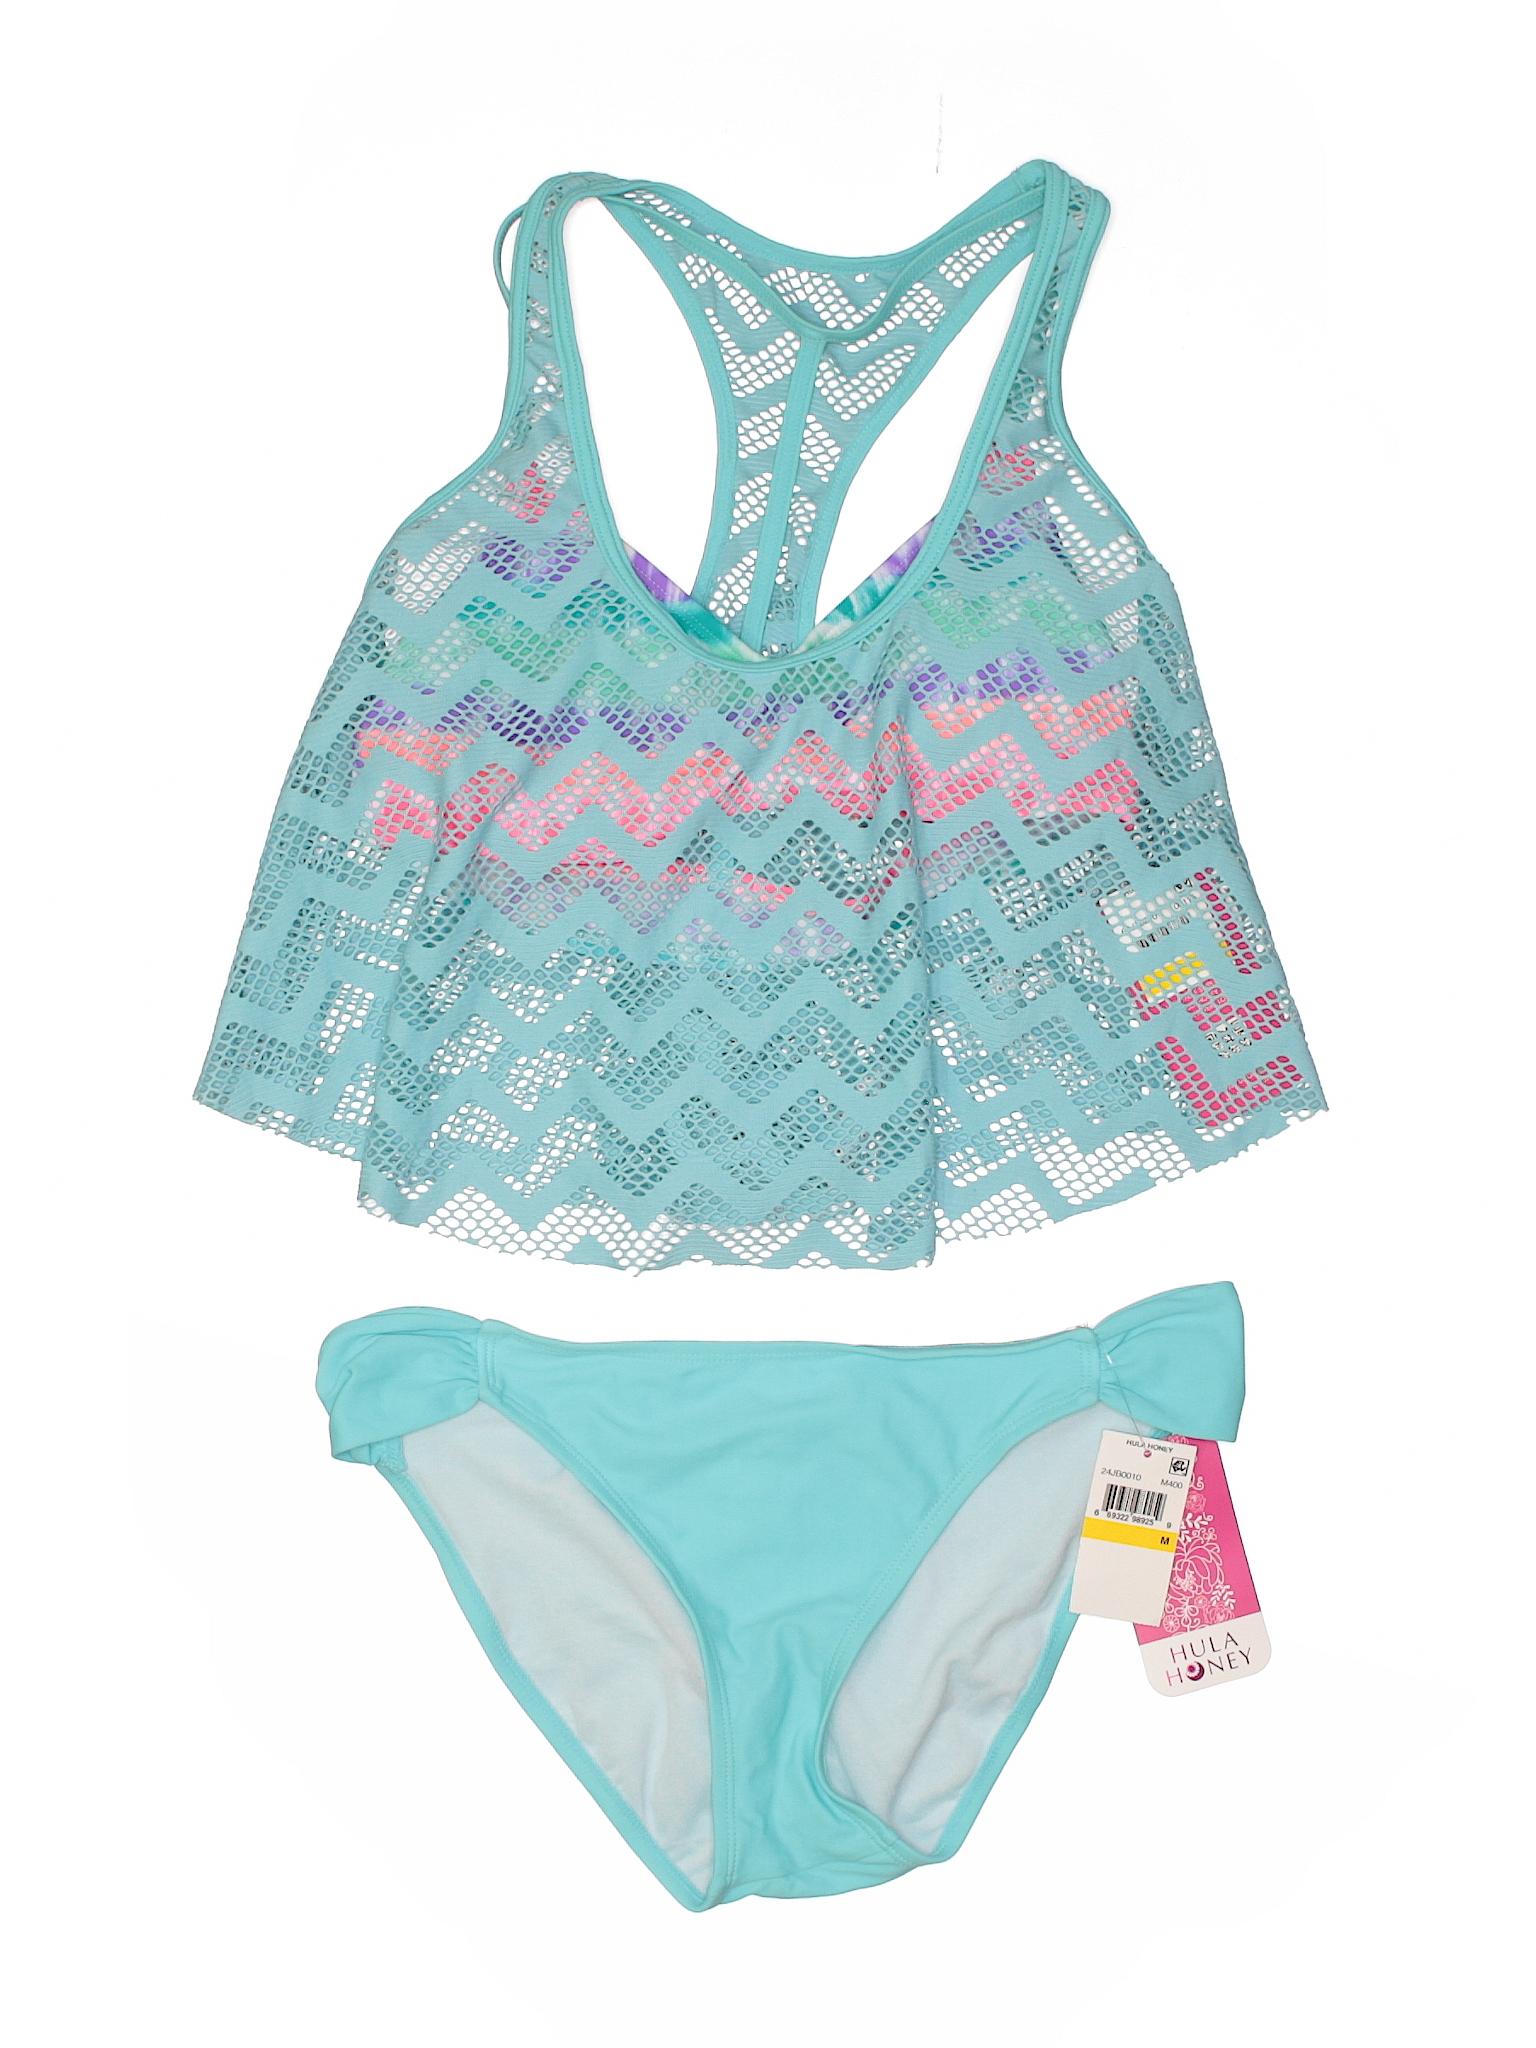 Boutique Honey Hula Swimsuit Two Piece rxqrz4X